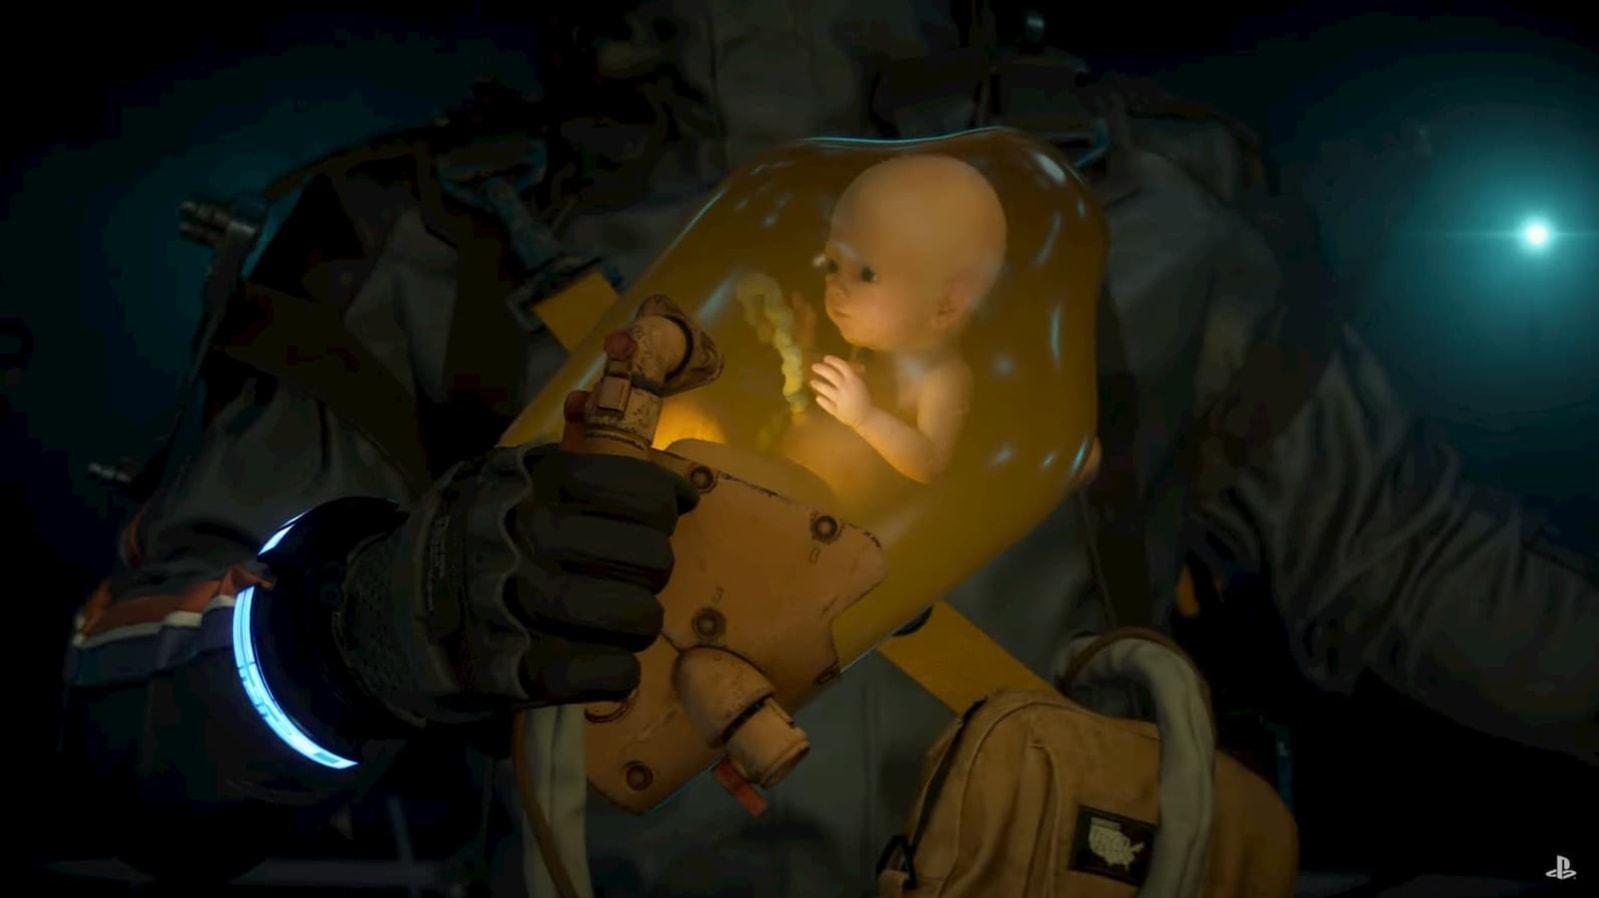 'Death Stranding' arrives on PS4 November 8th